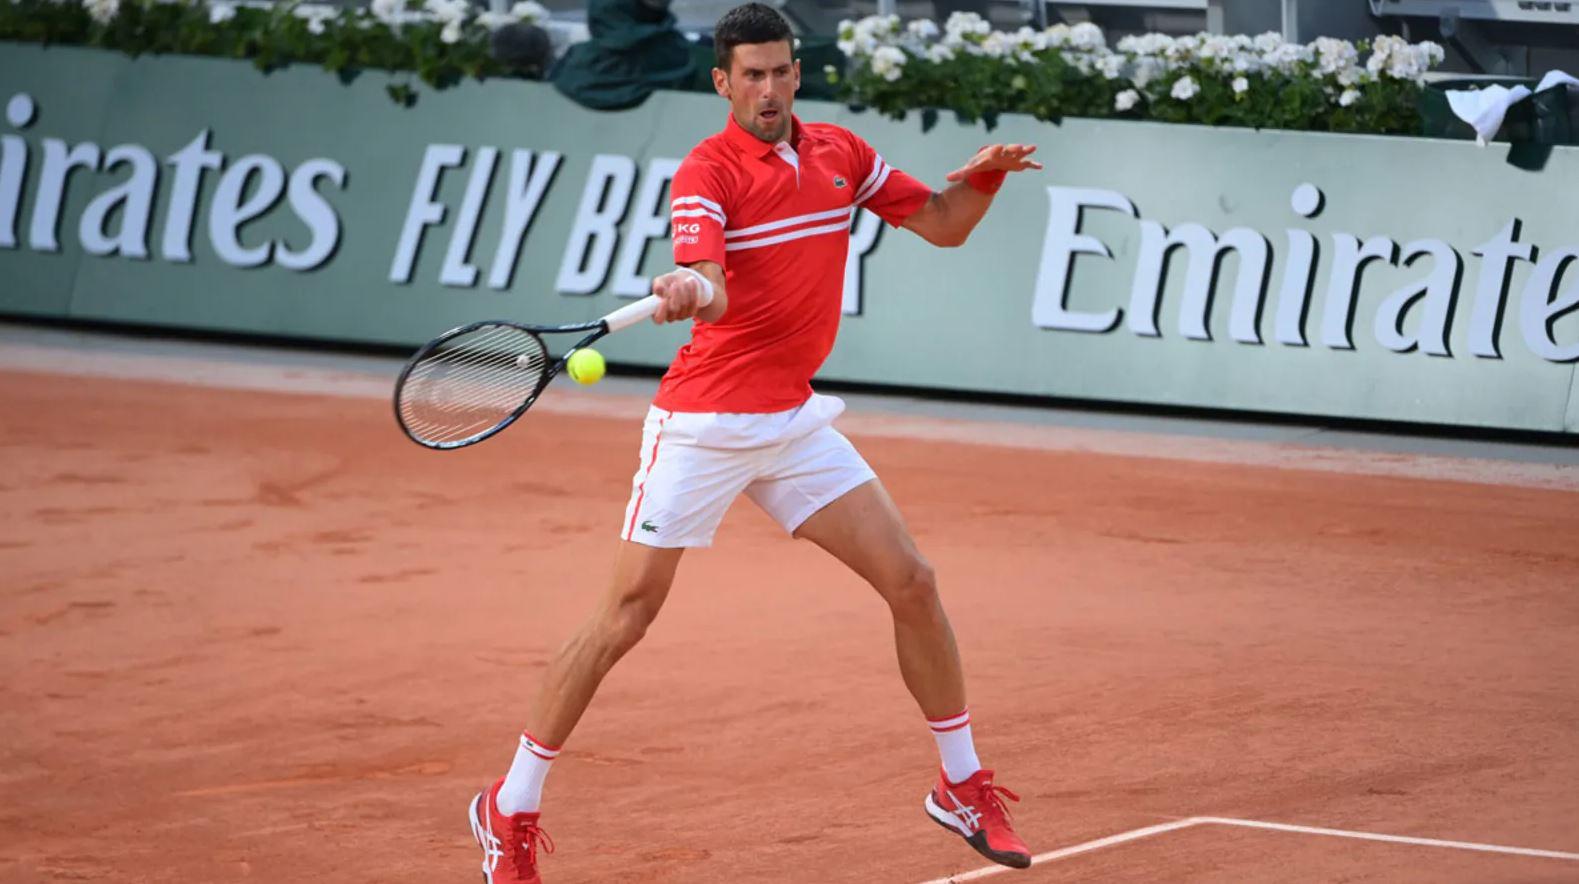 djokovic - Roland Garros: Đoković brez težav do osmine finala